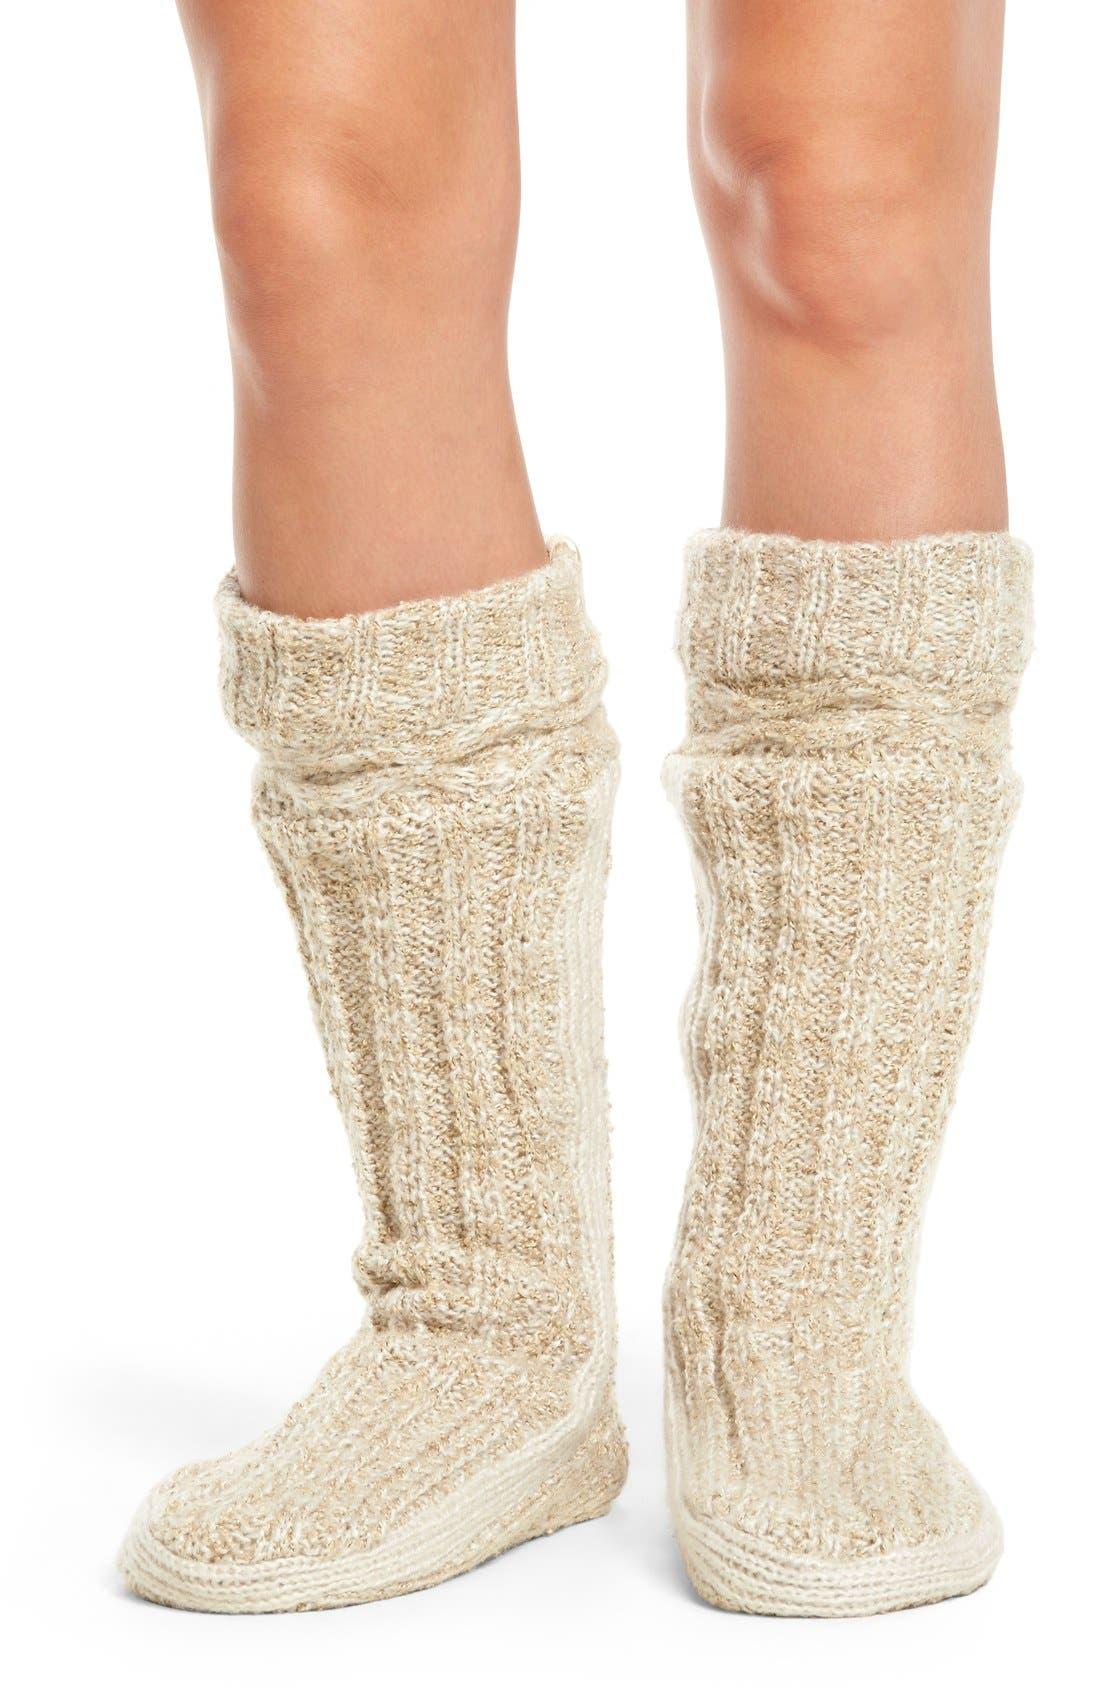 URBAN KNIT Bootie Slipper Socks, Main, color, 280